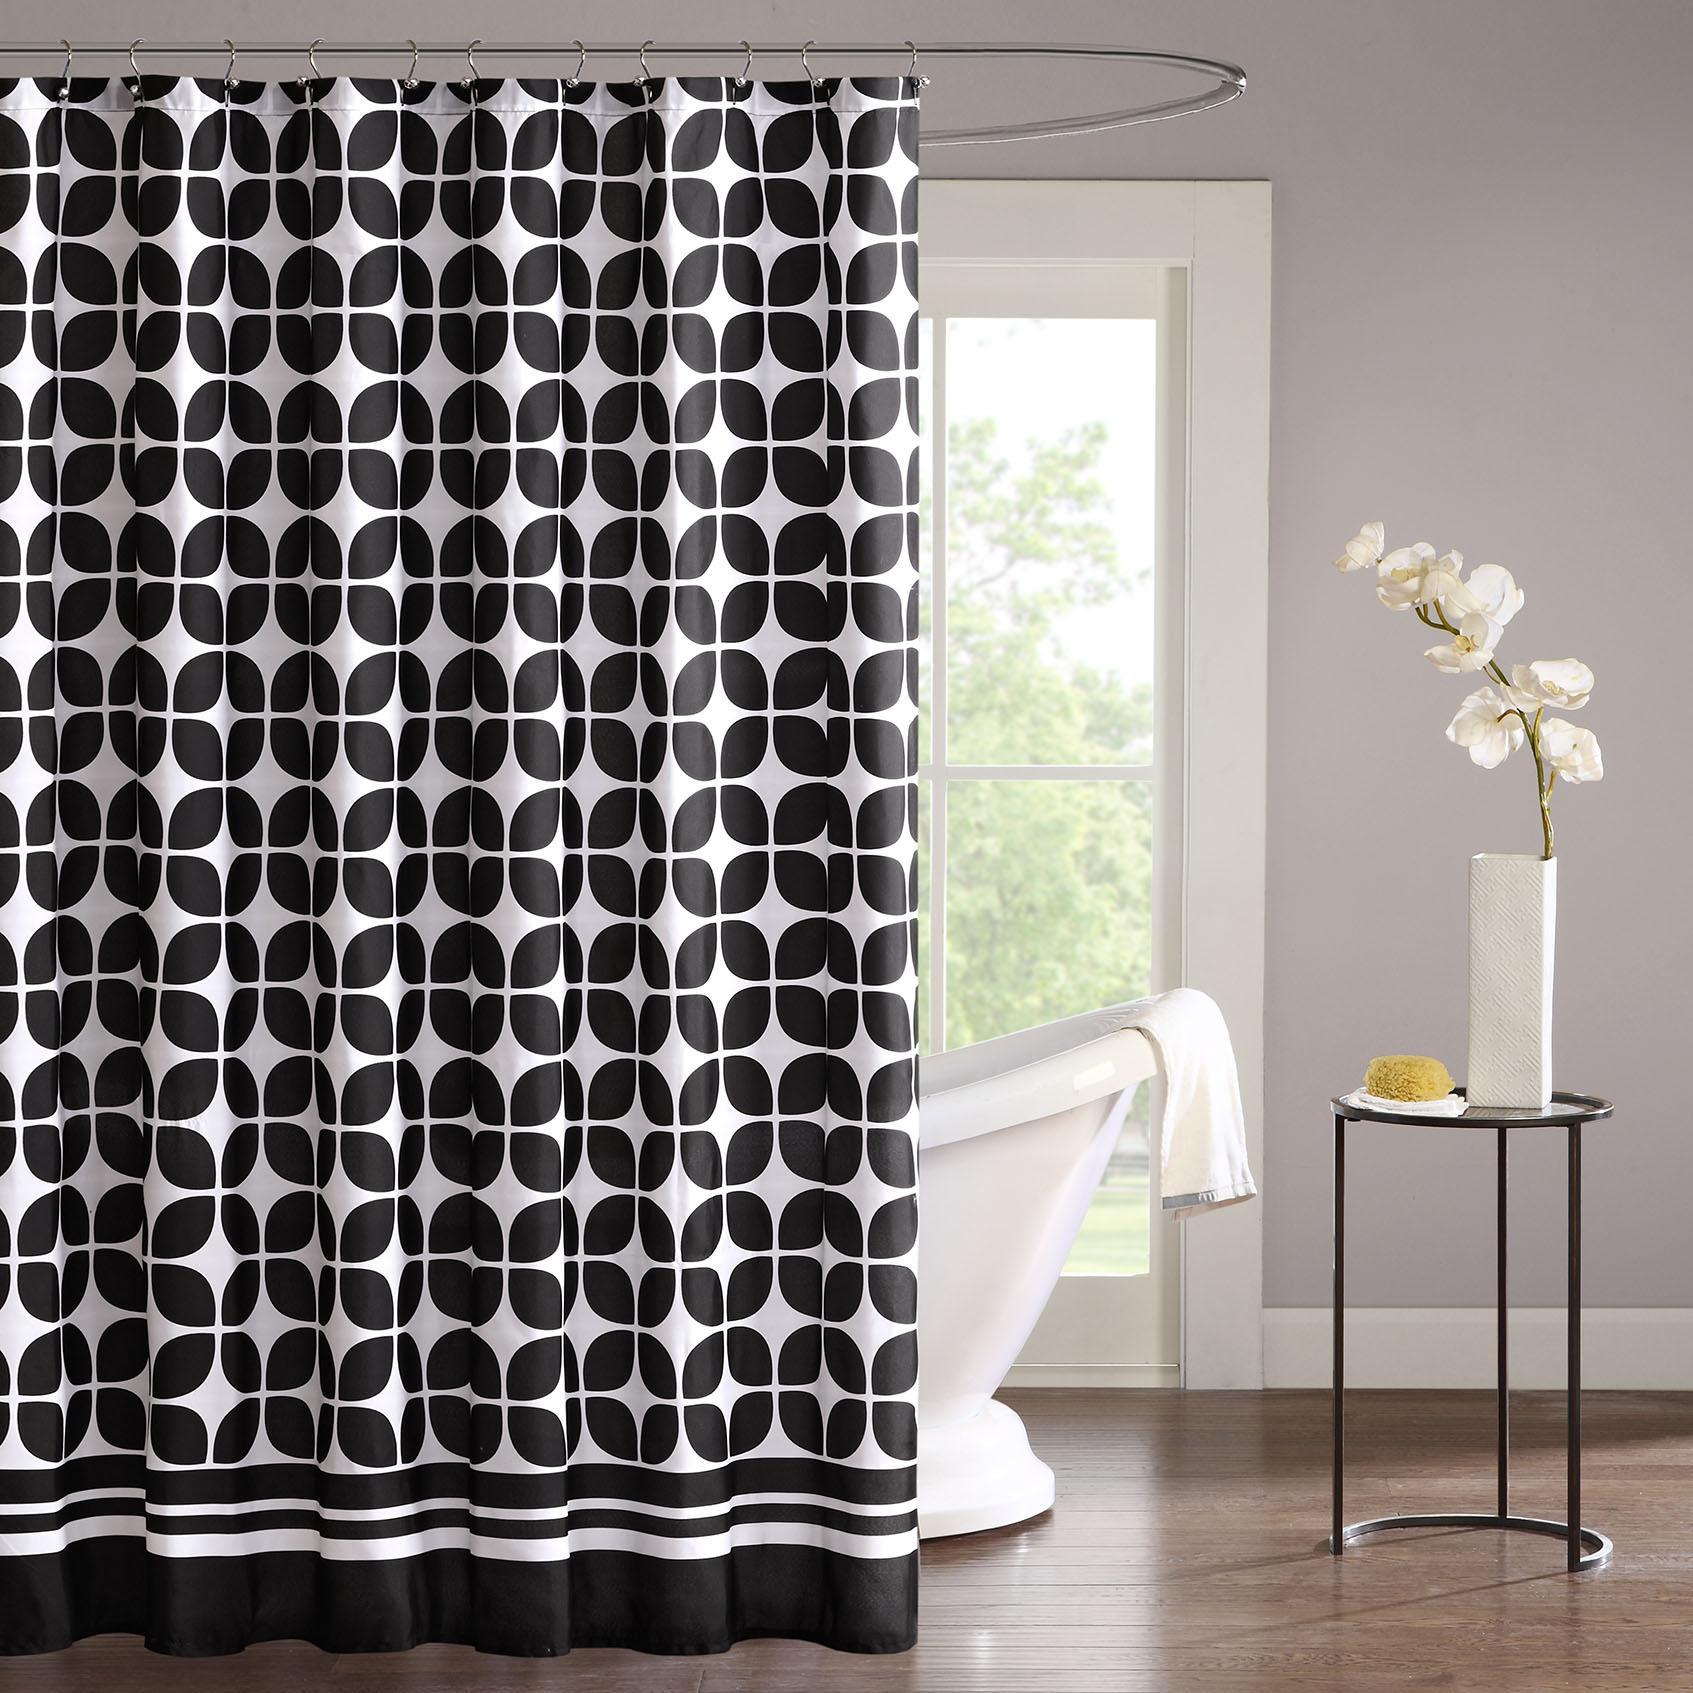 Amazon Intelligent Design ID70 508 Lita Shower Curtain 72x72